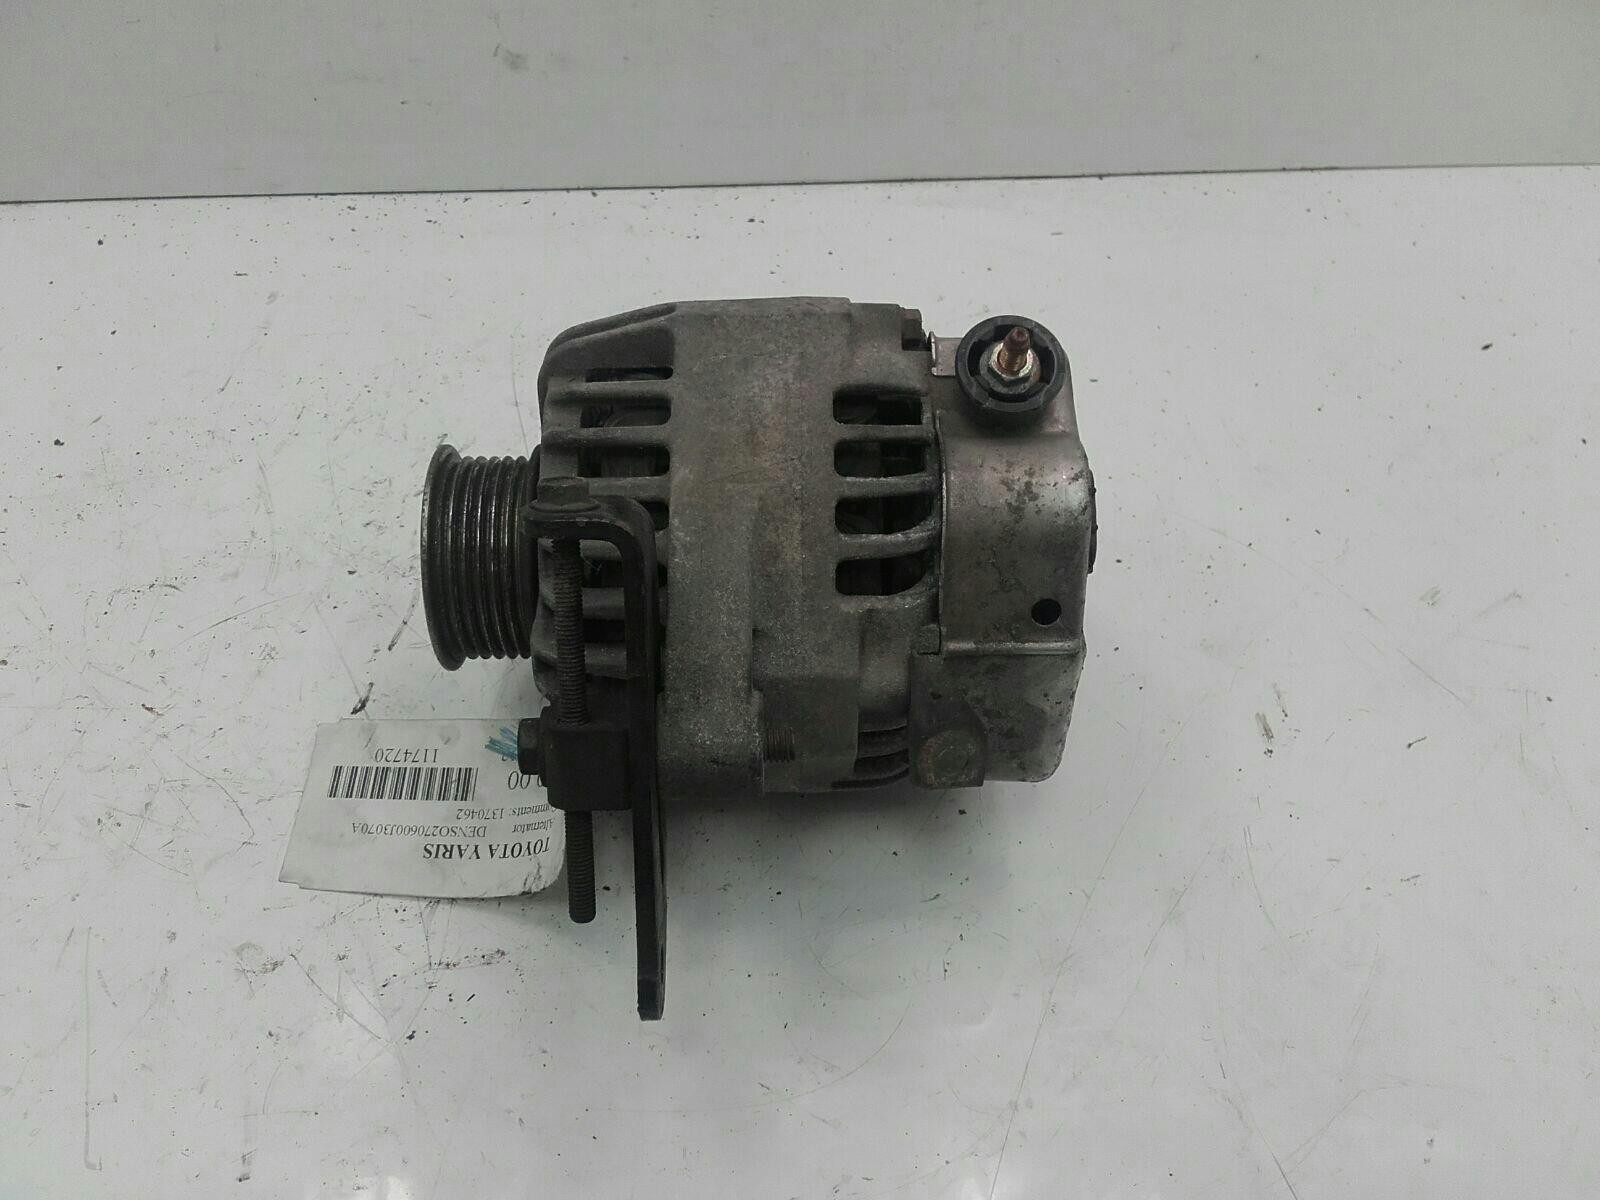 Toyota Yaris 2003 To 2005 Alternator Petrol Manual For Sale From Wiring Diagram T3 10 1sz Fe 27060 0j030